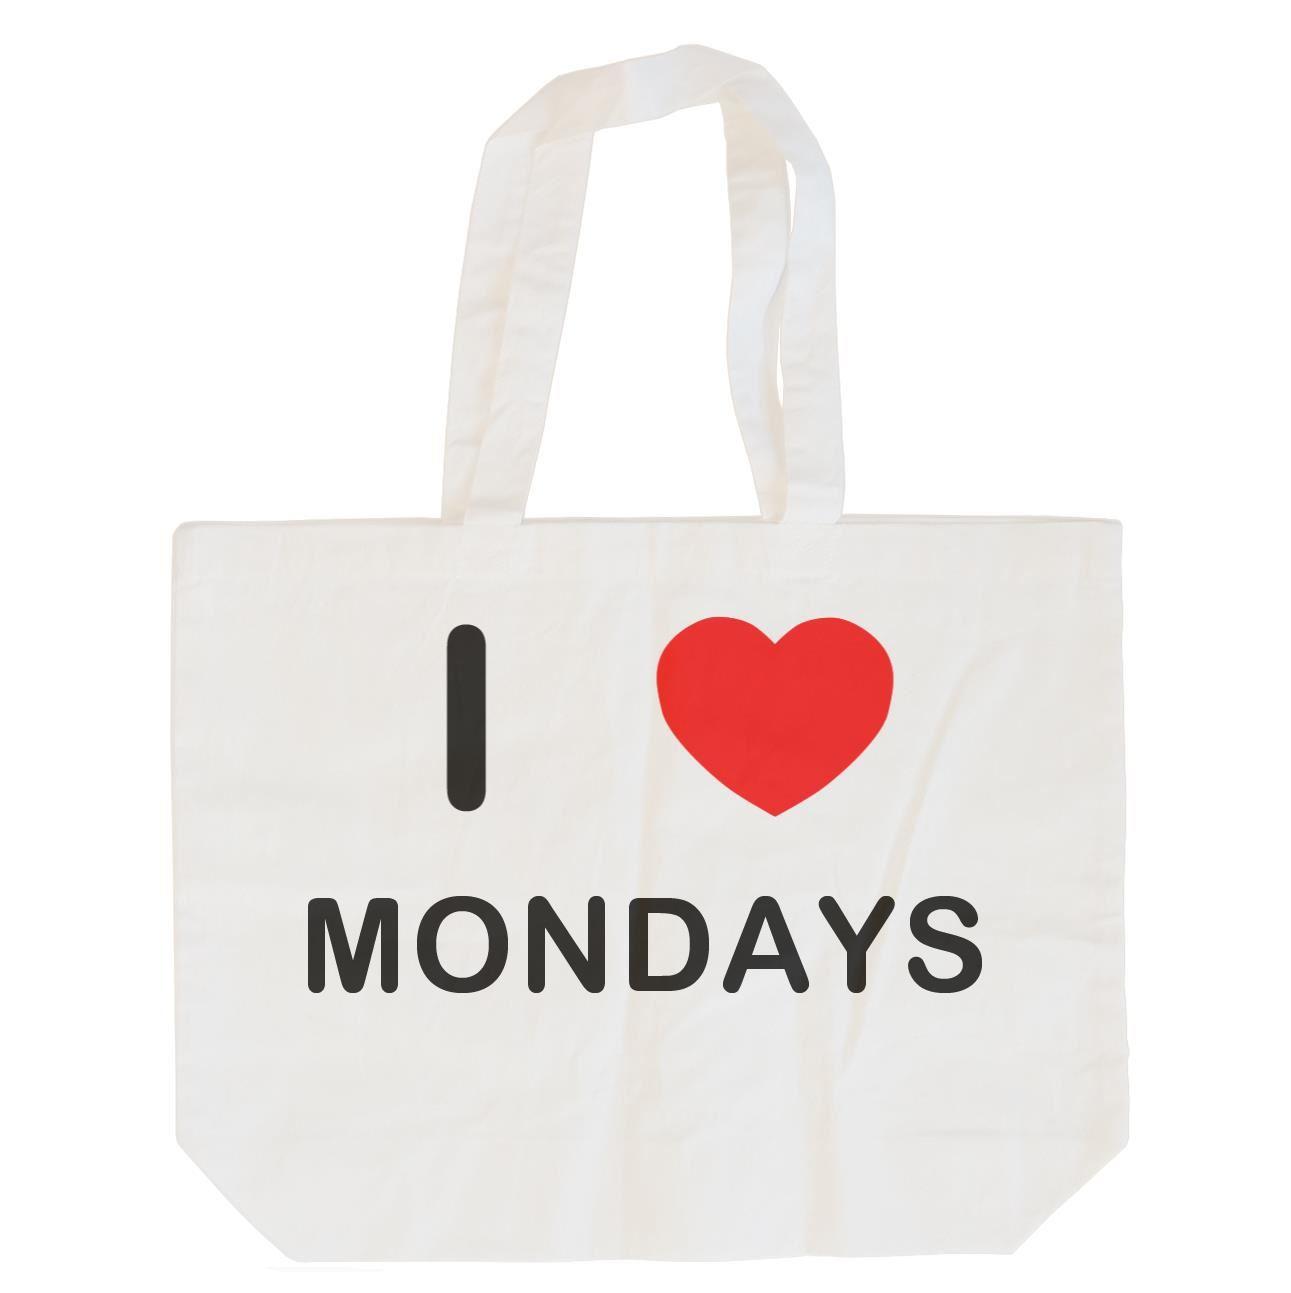 I Love Mondays - Cotton Bag   Size choice Tote, Shopper or Sling